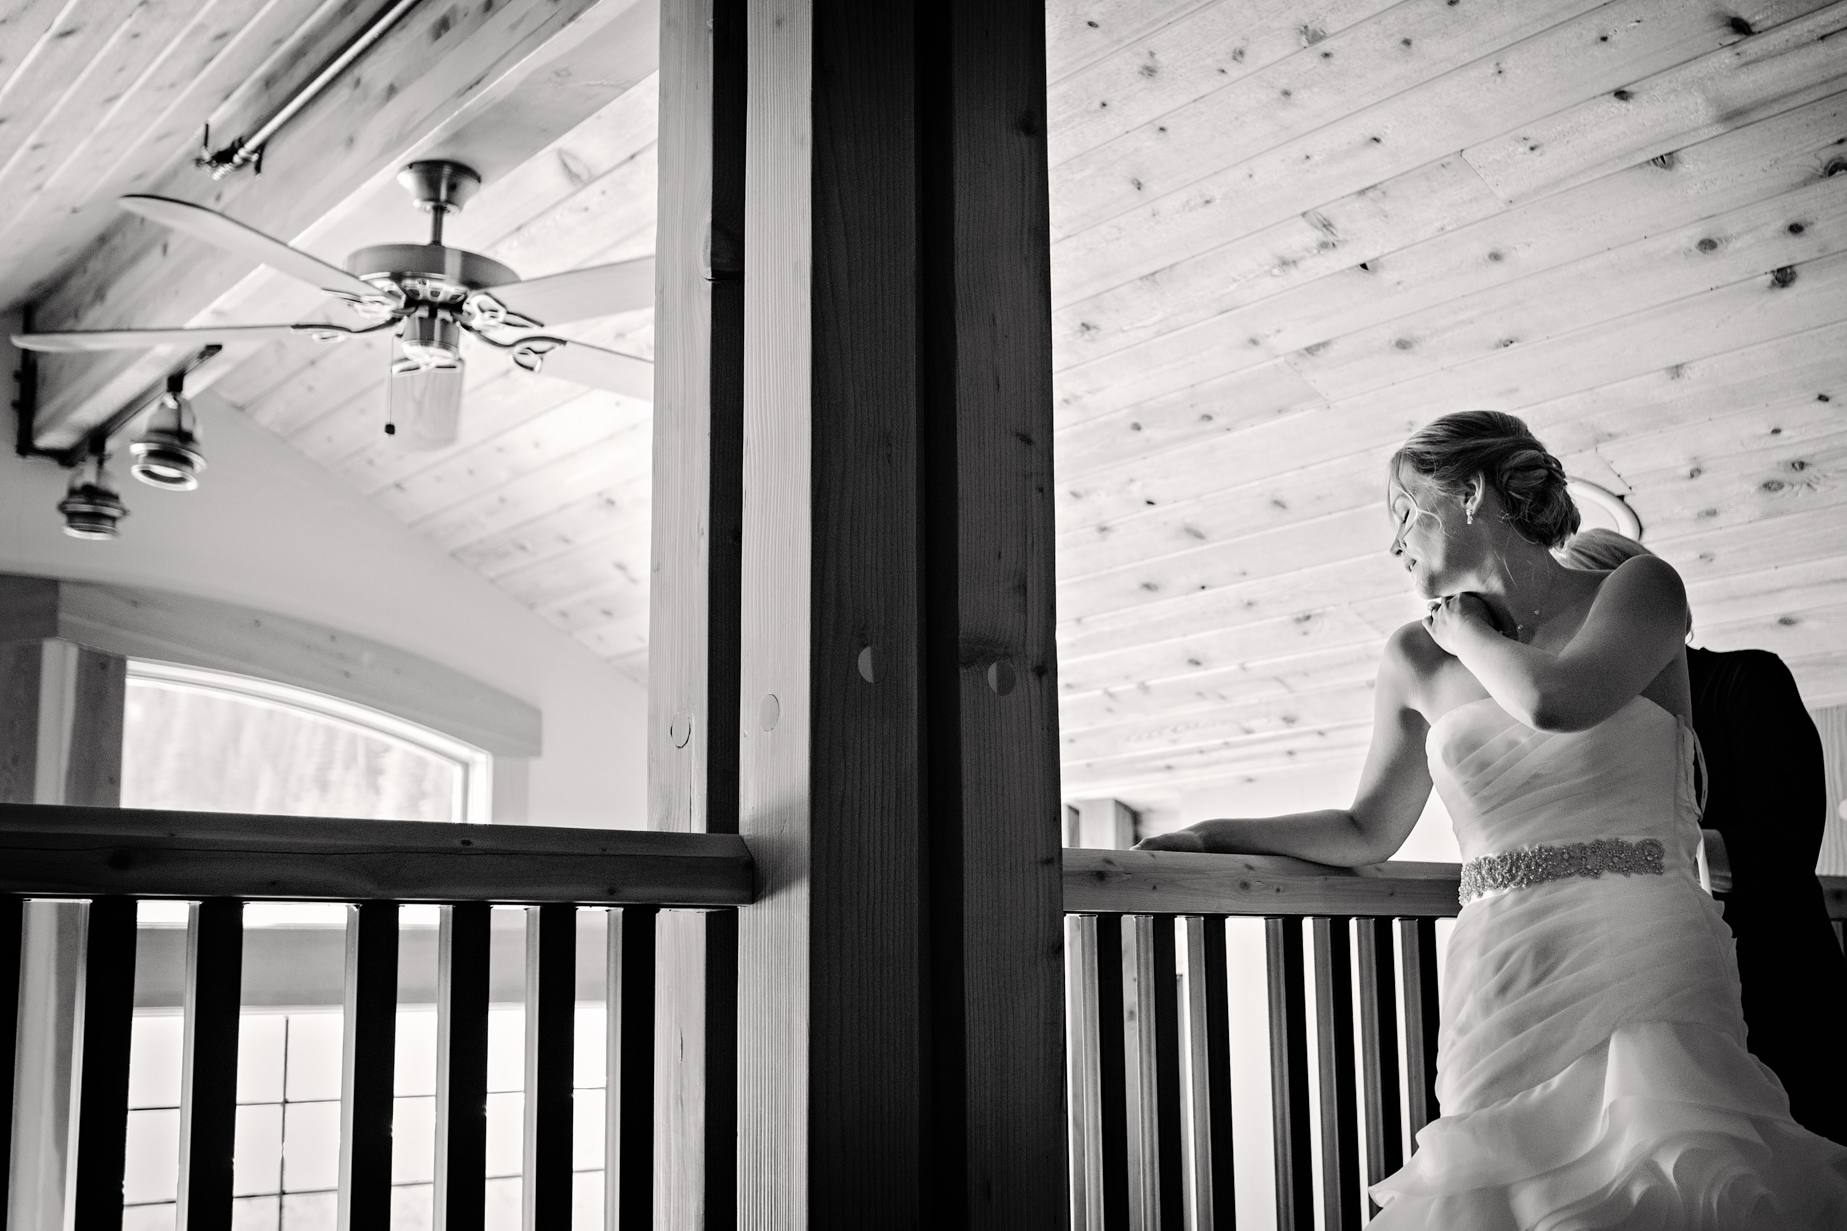 big-sky-resort-wedding-brides-mom-assists-dress.jpg